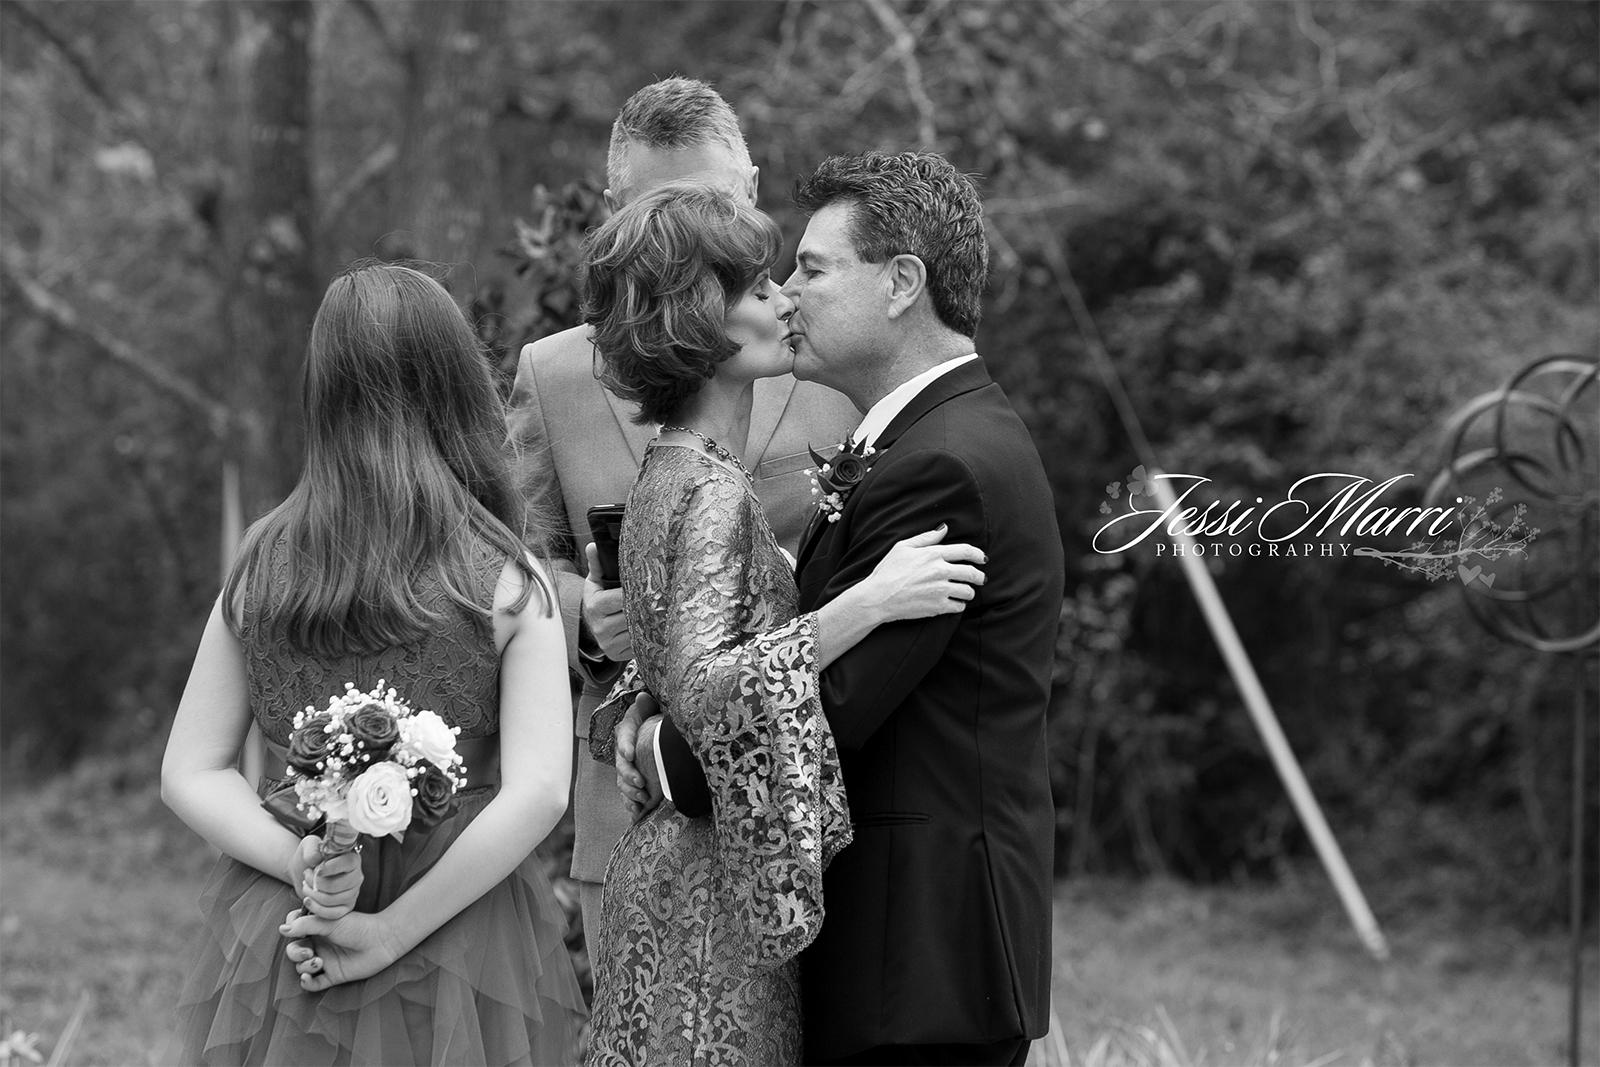 Wedding Photography Houston Prices: Best Wedding Photographer Houston